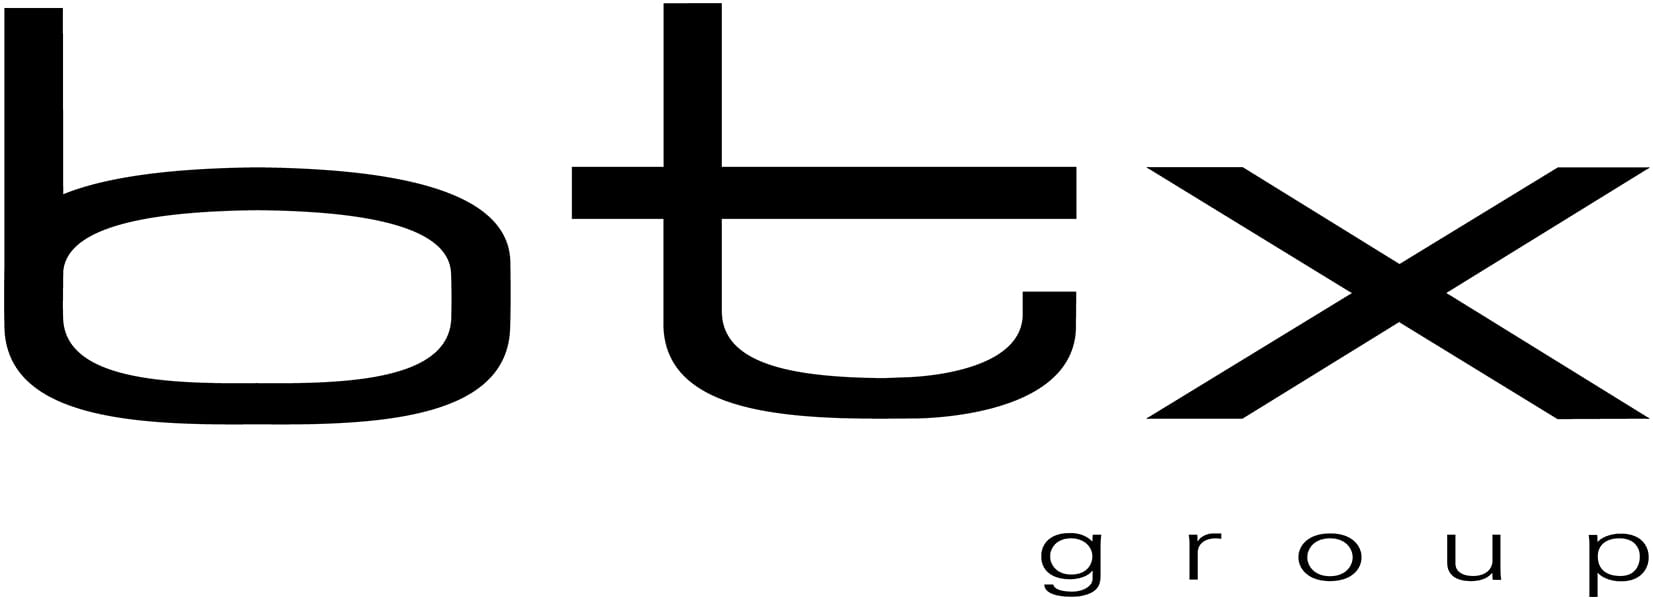 btx group